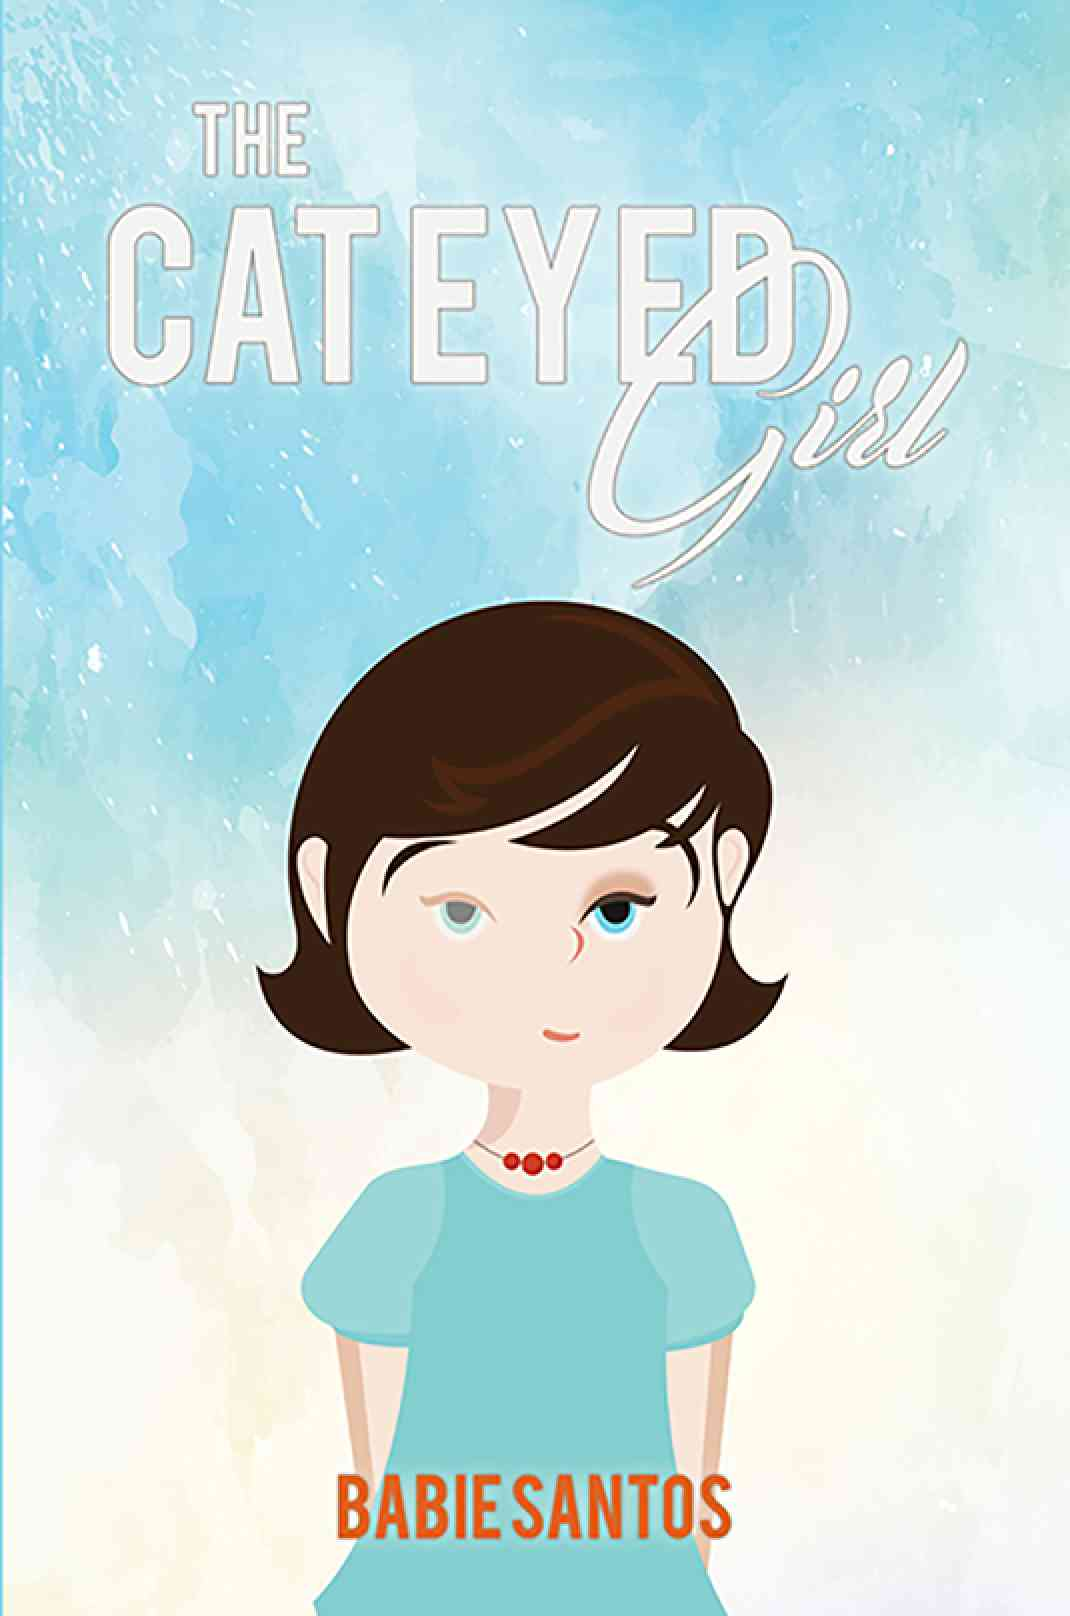 The Cat Eyed Girl